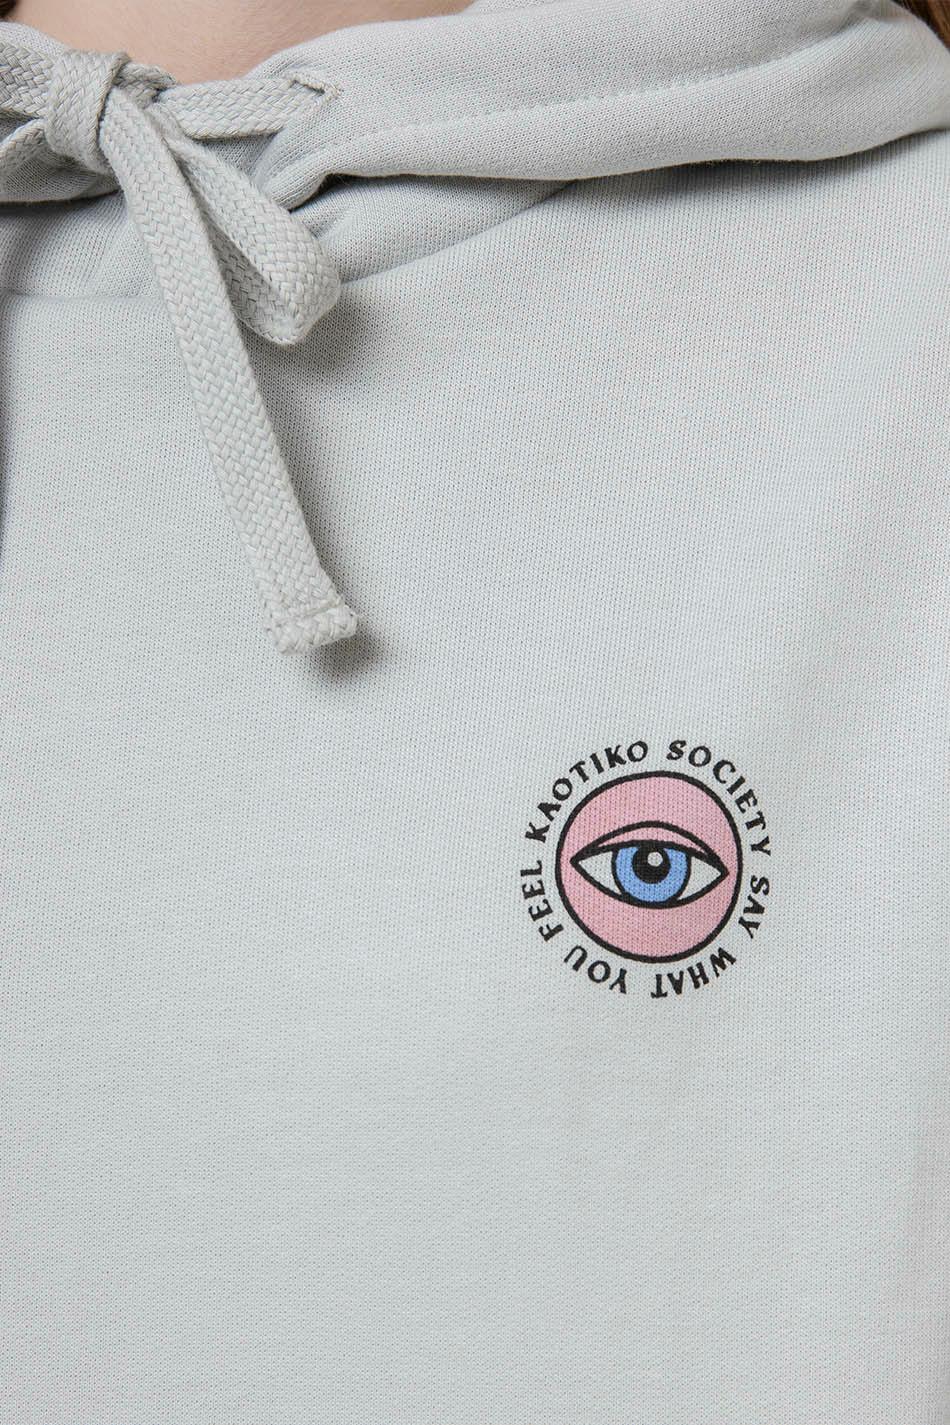 Sudadera Capucha Eye Say Cemento